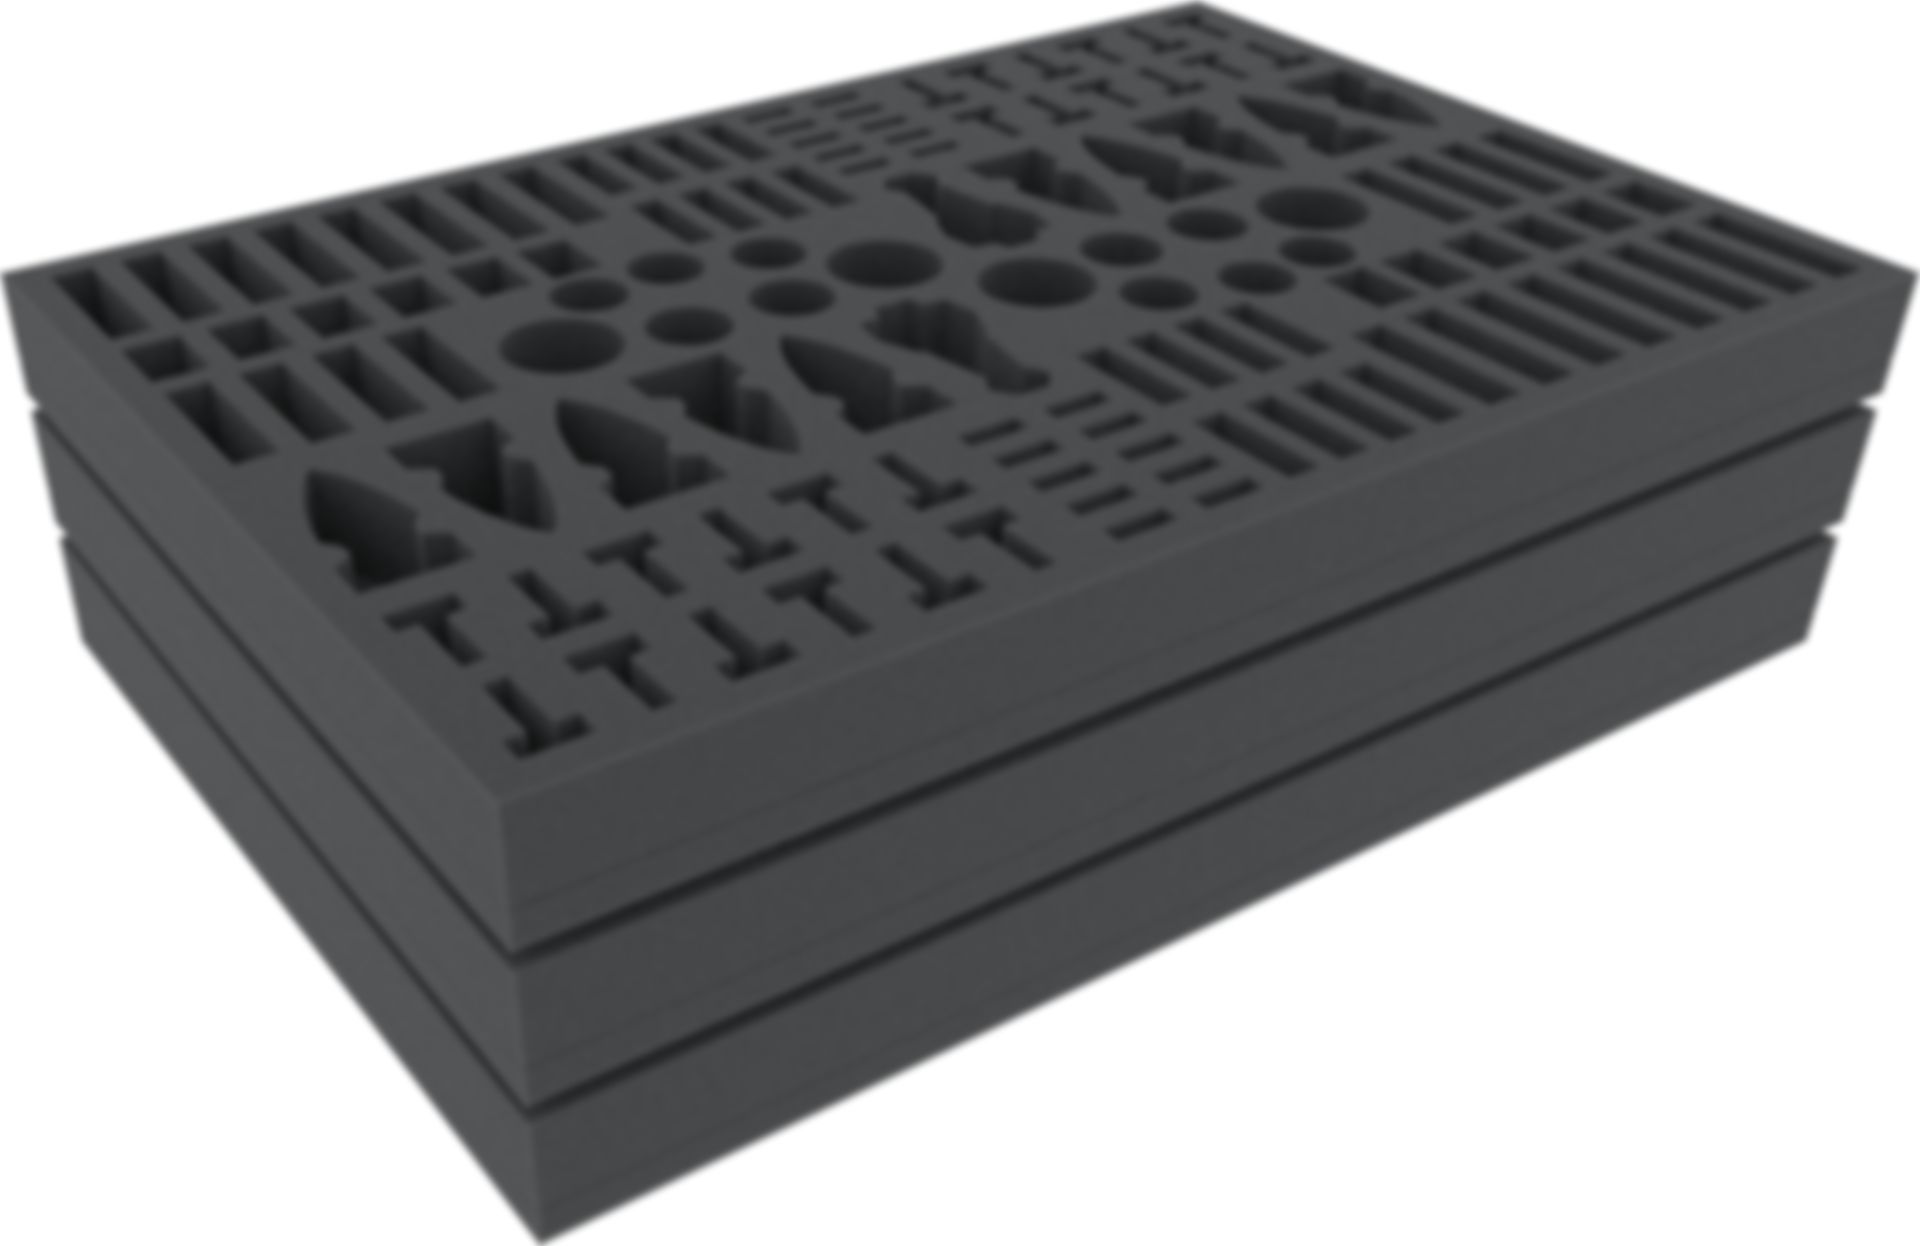 Feldherr foam set for Twilight Imperium 4th Edition components